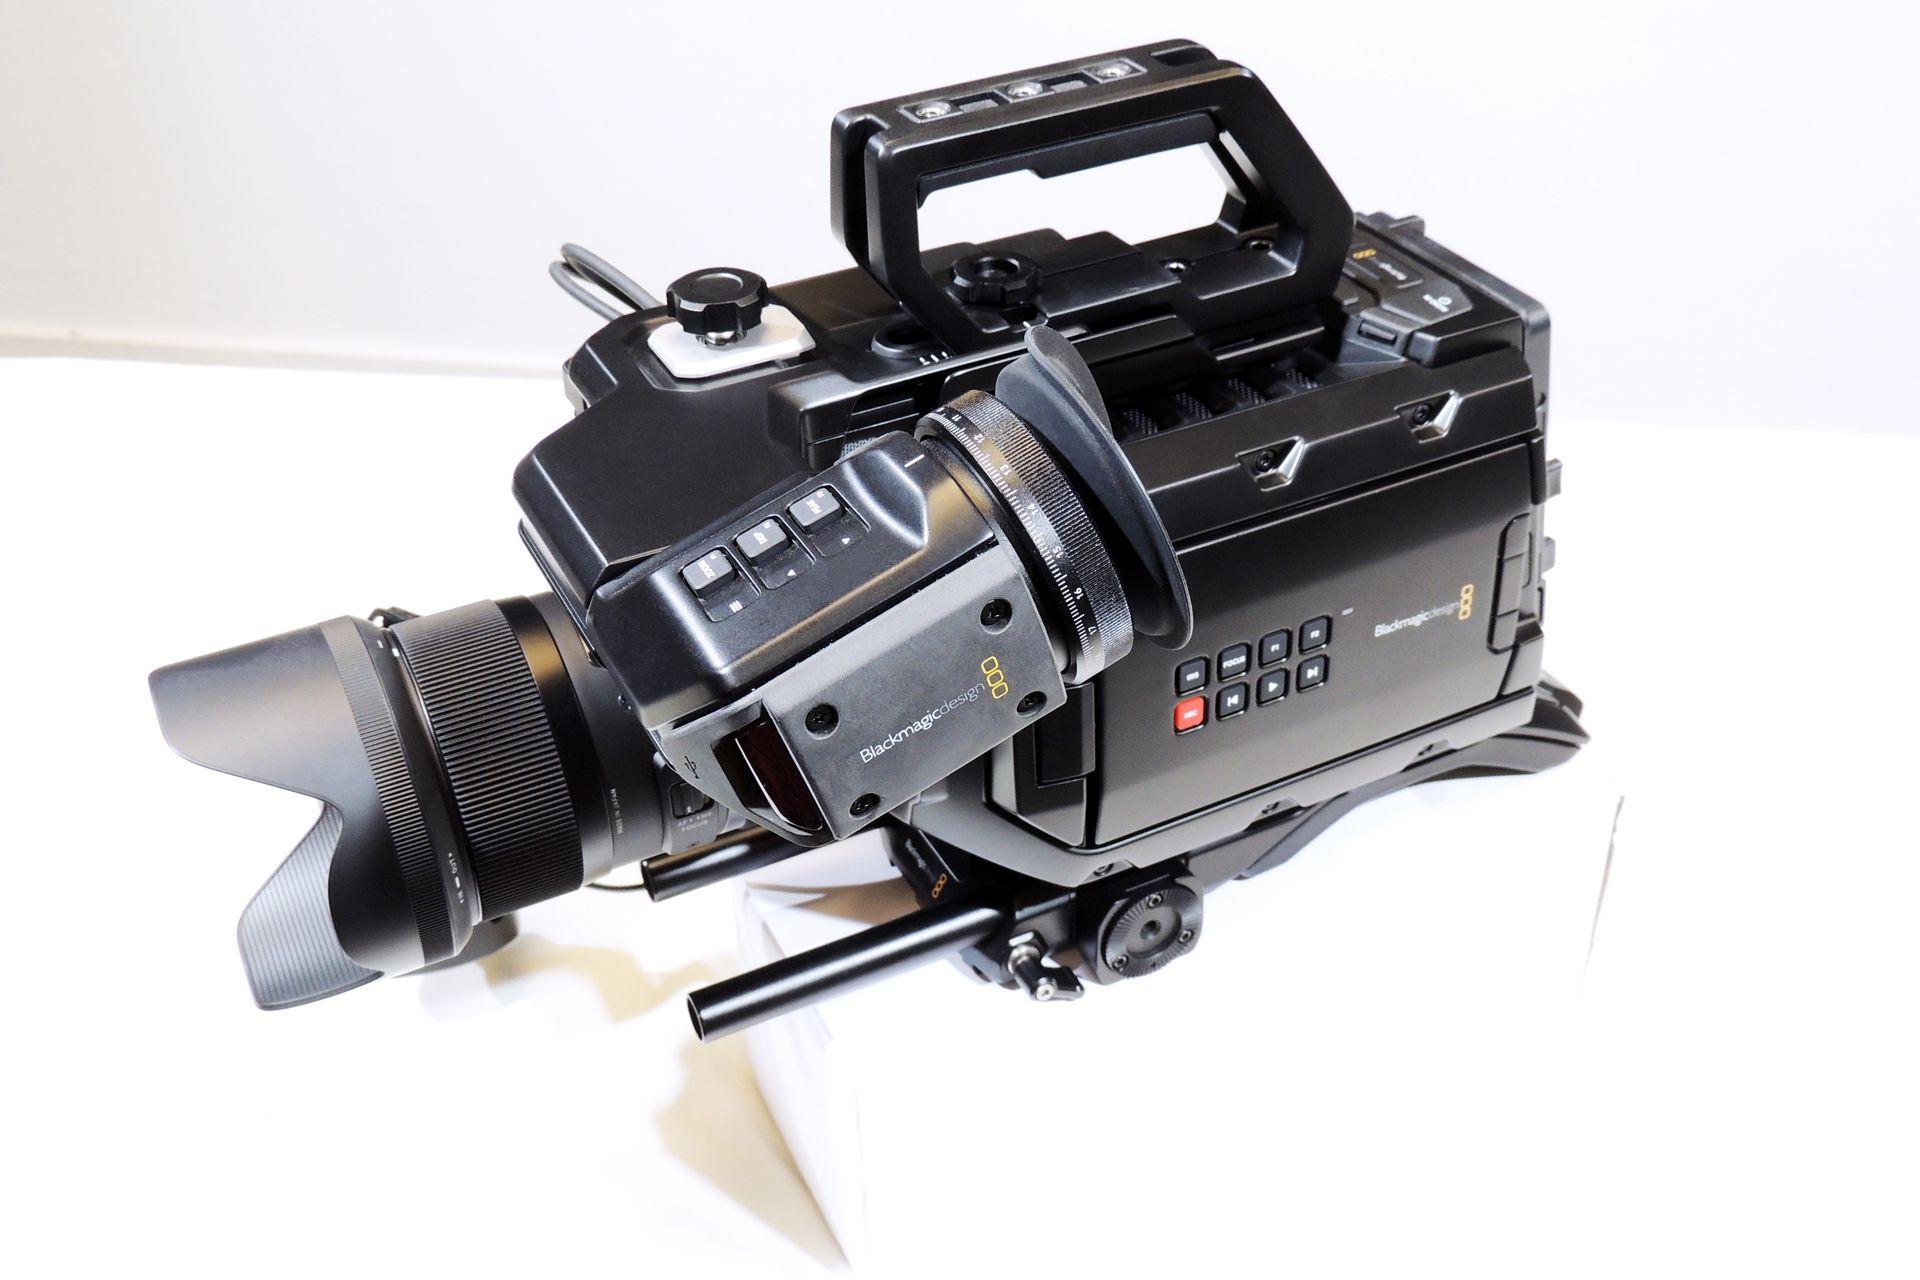 Black Magic Design Ursa Mini 4k Canon fit for sale at Plasma Music